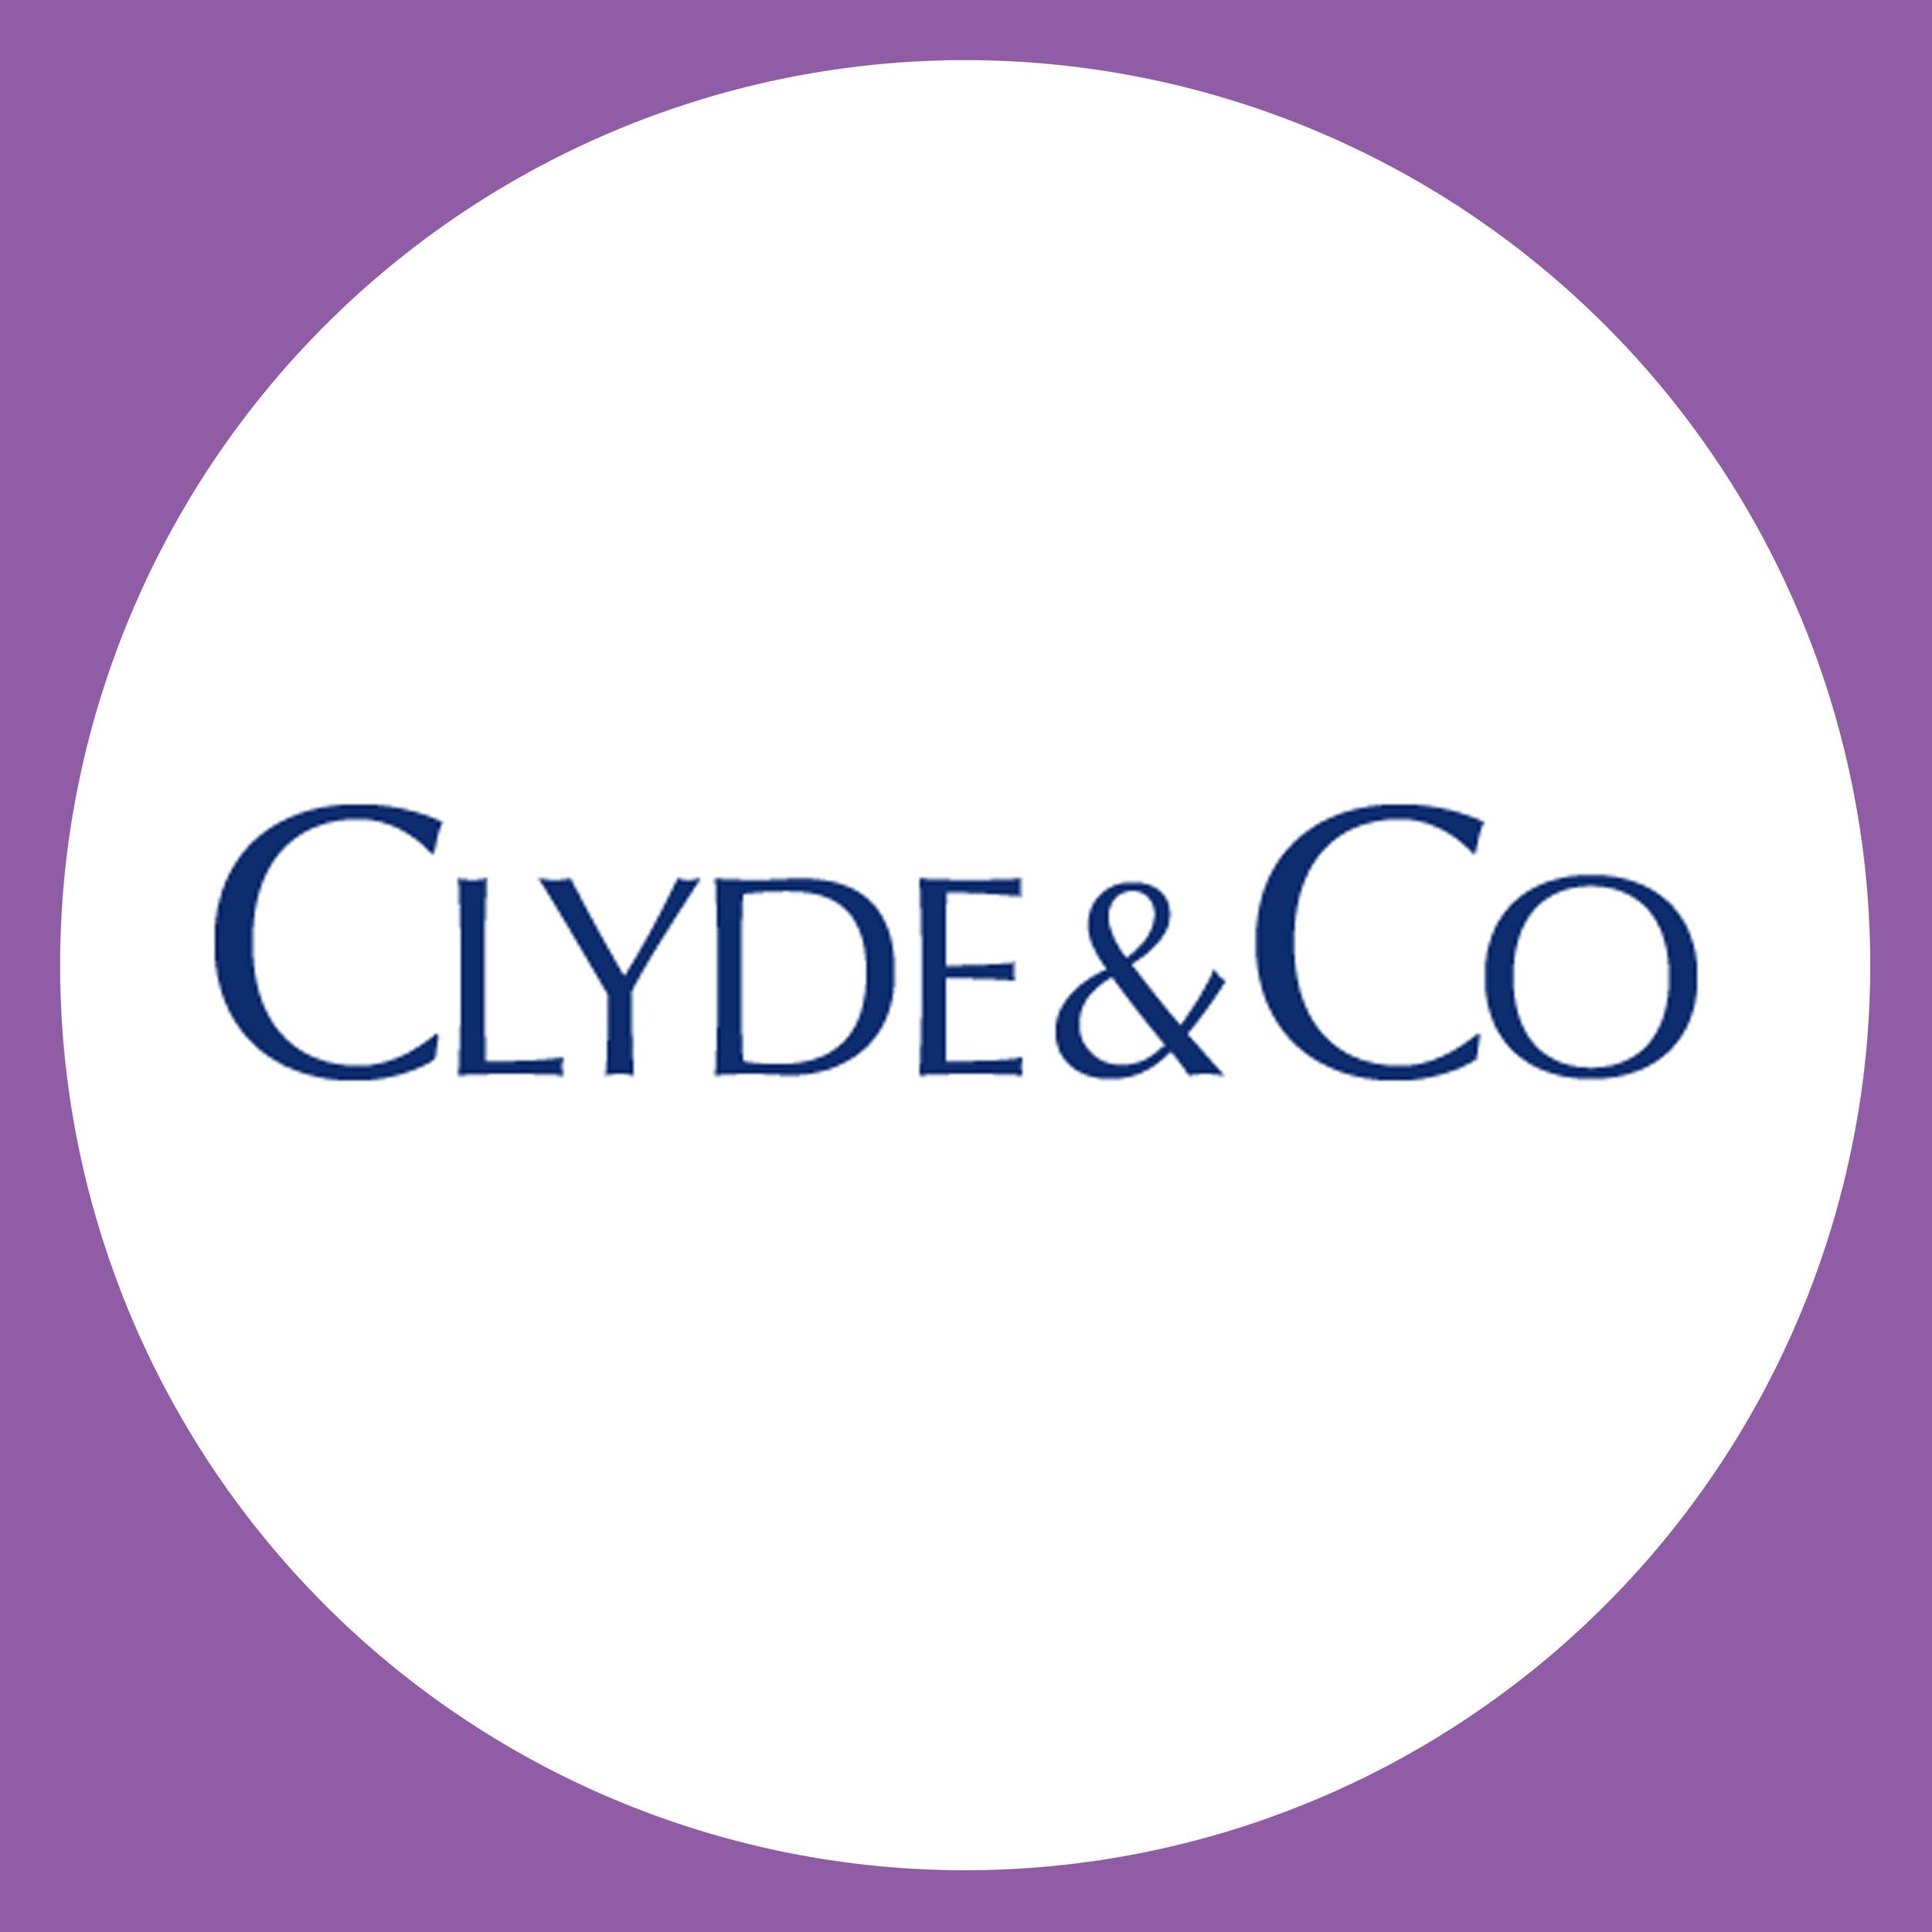 Clyde  Co logo in circle_RGB.jpg